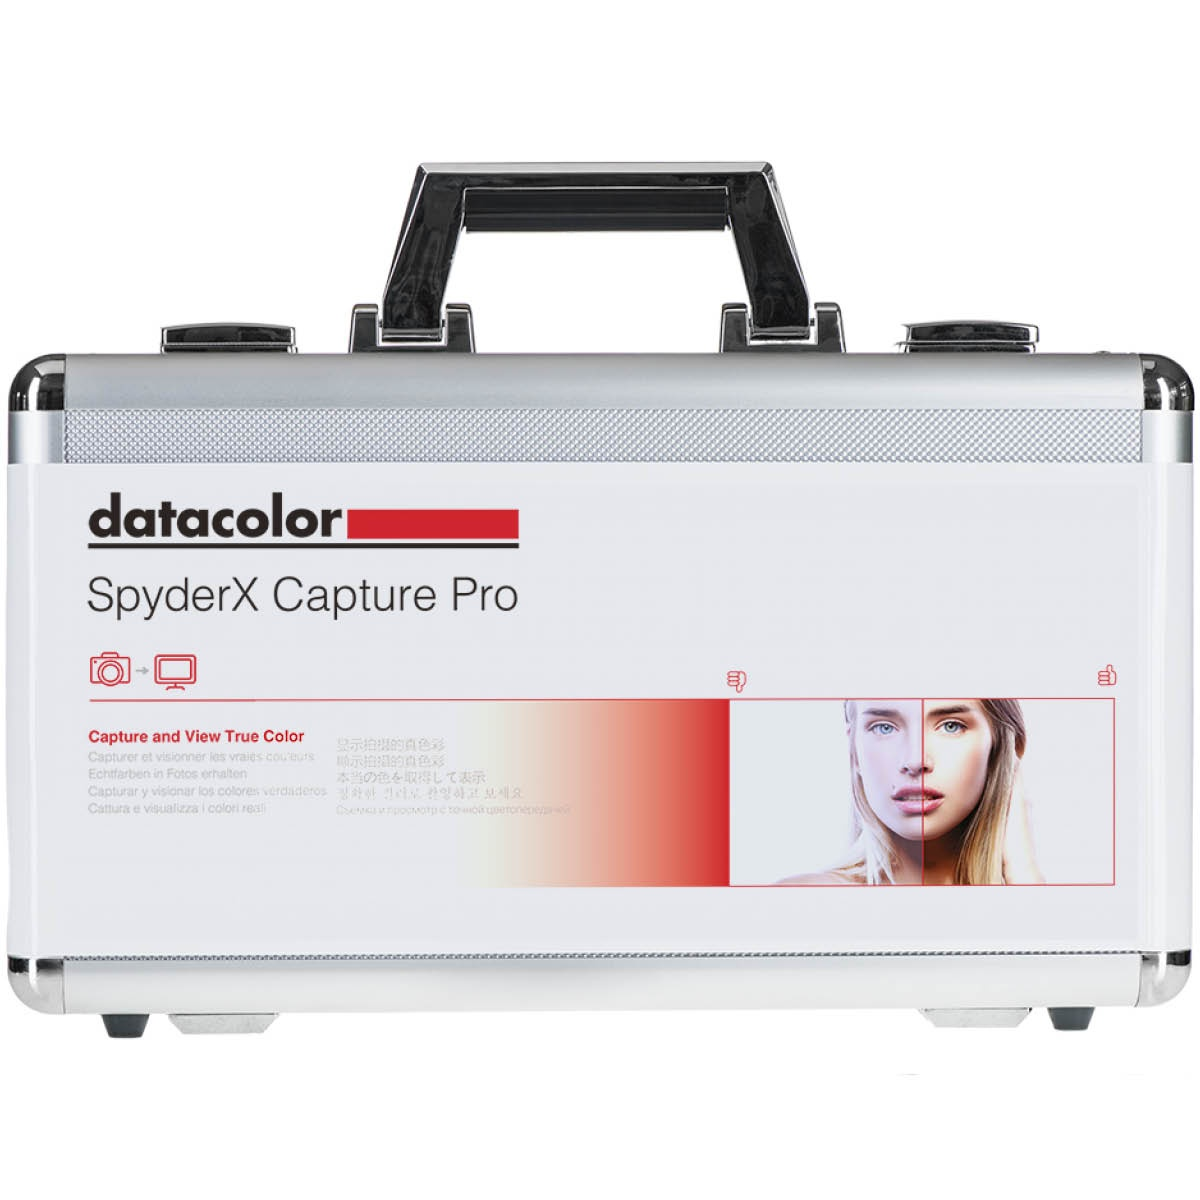 Datacolor Spyder X Capture Pro